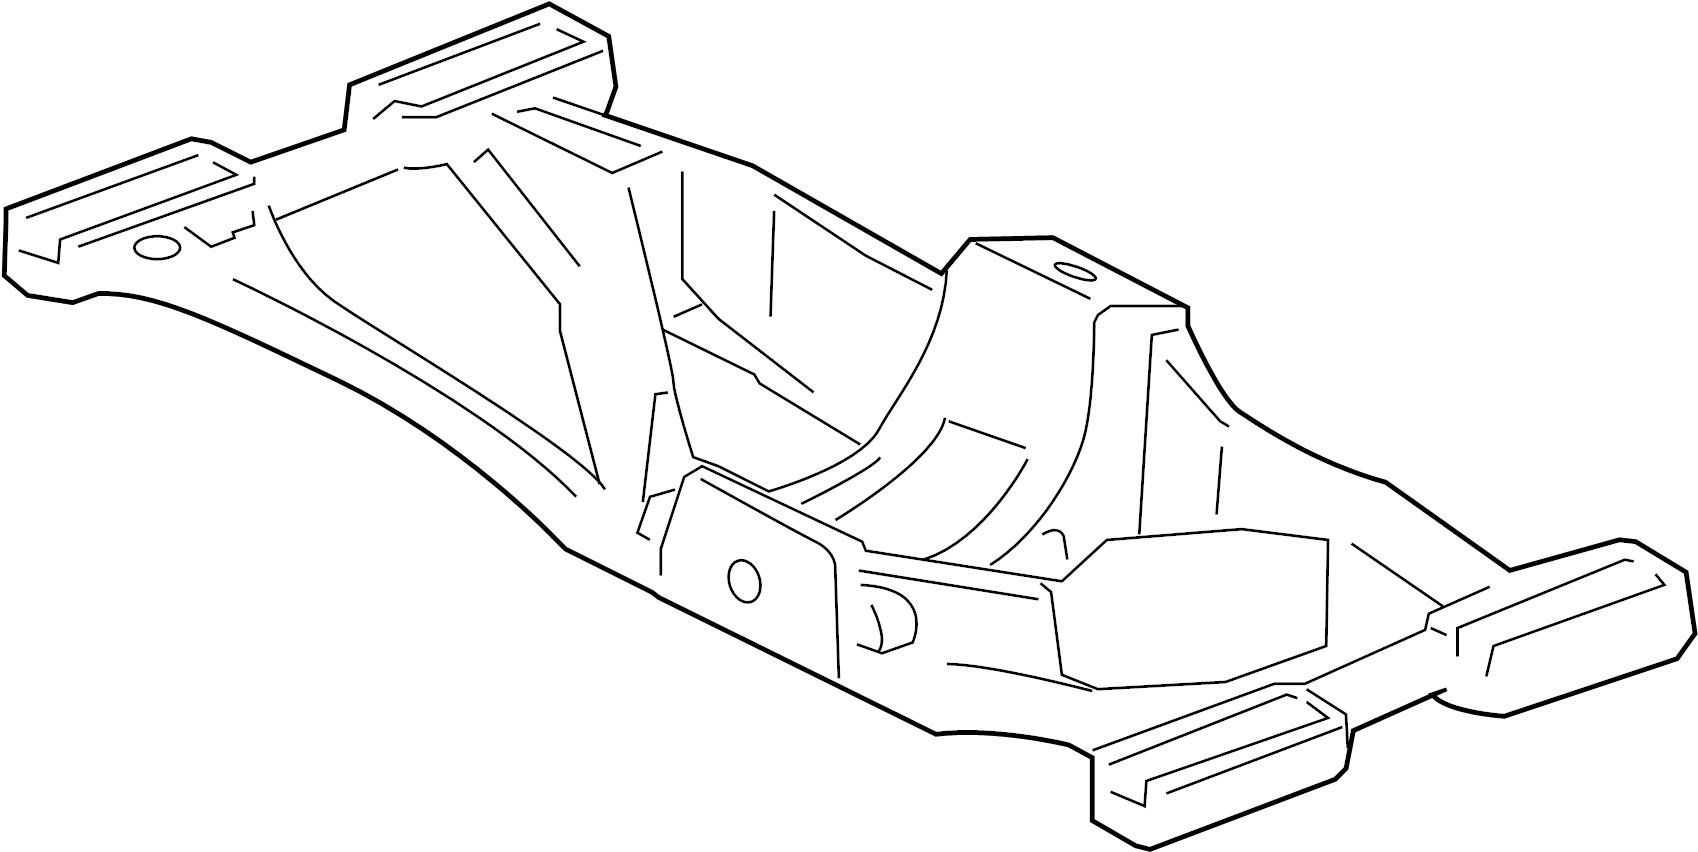 Jaguar Xj8 Automatic Transmission Mount Bracket